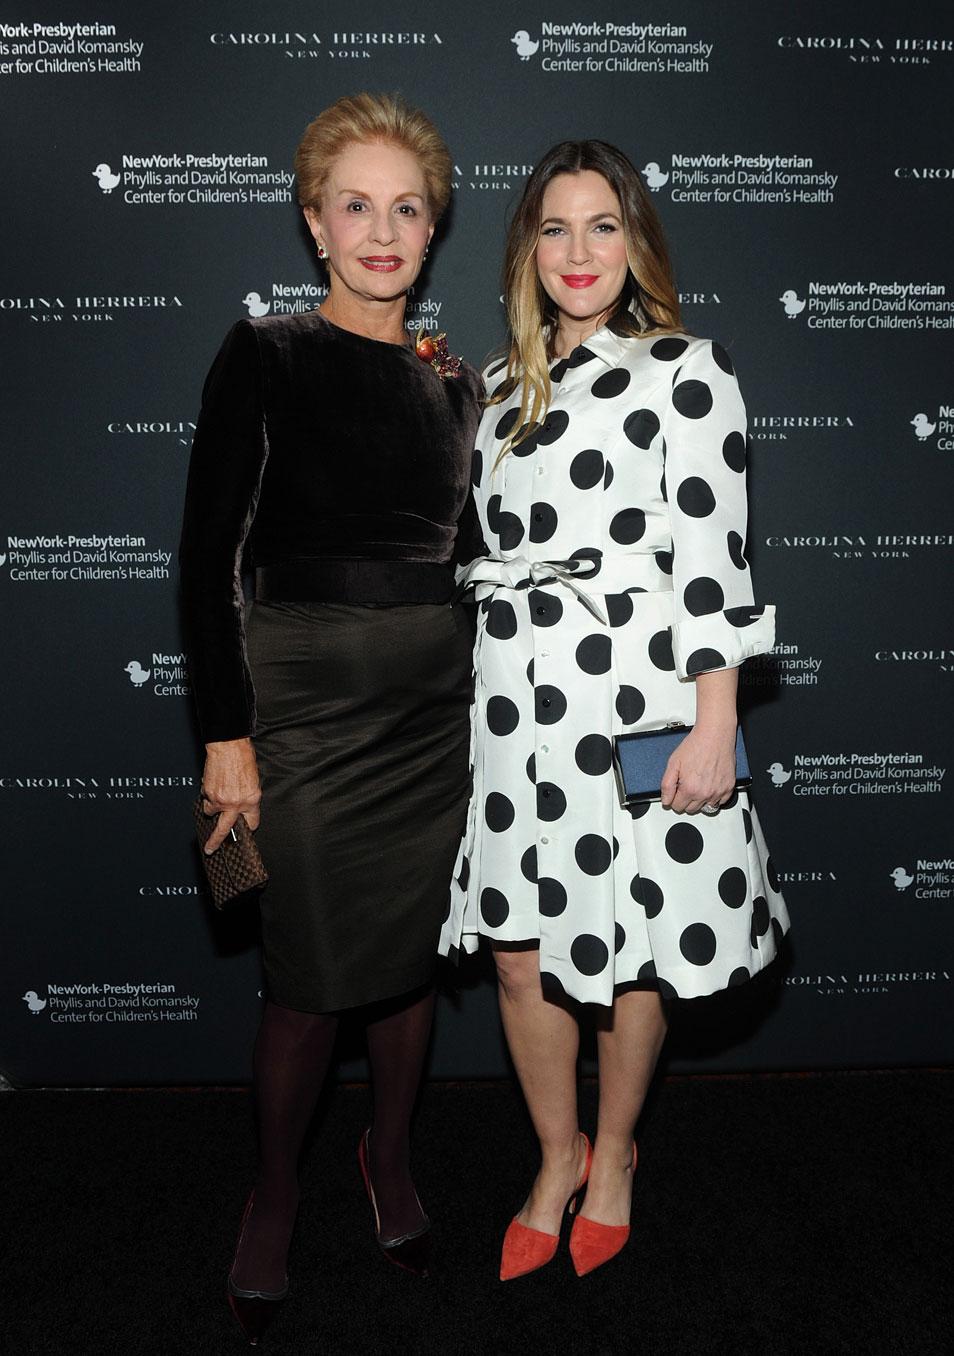 Carolina Herrera y Drew Barrymore.